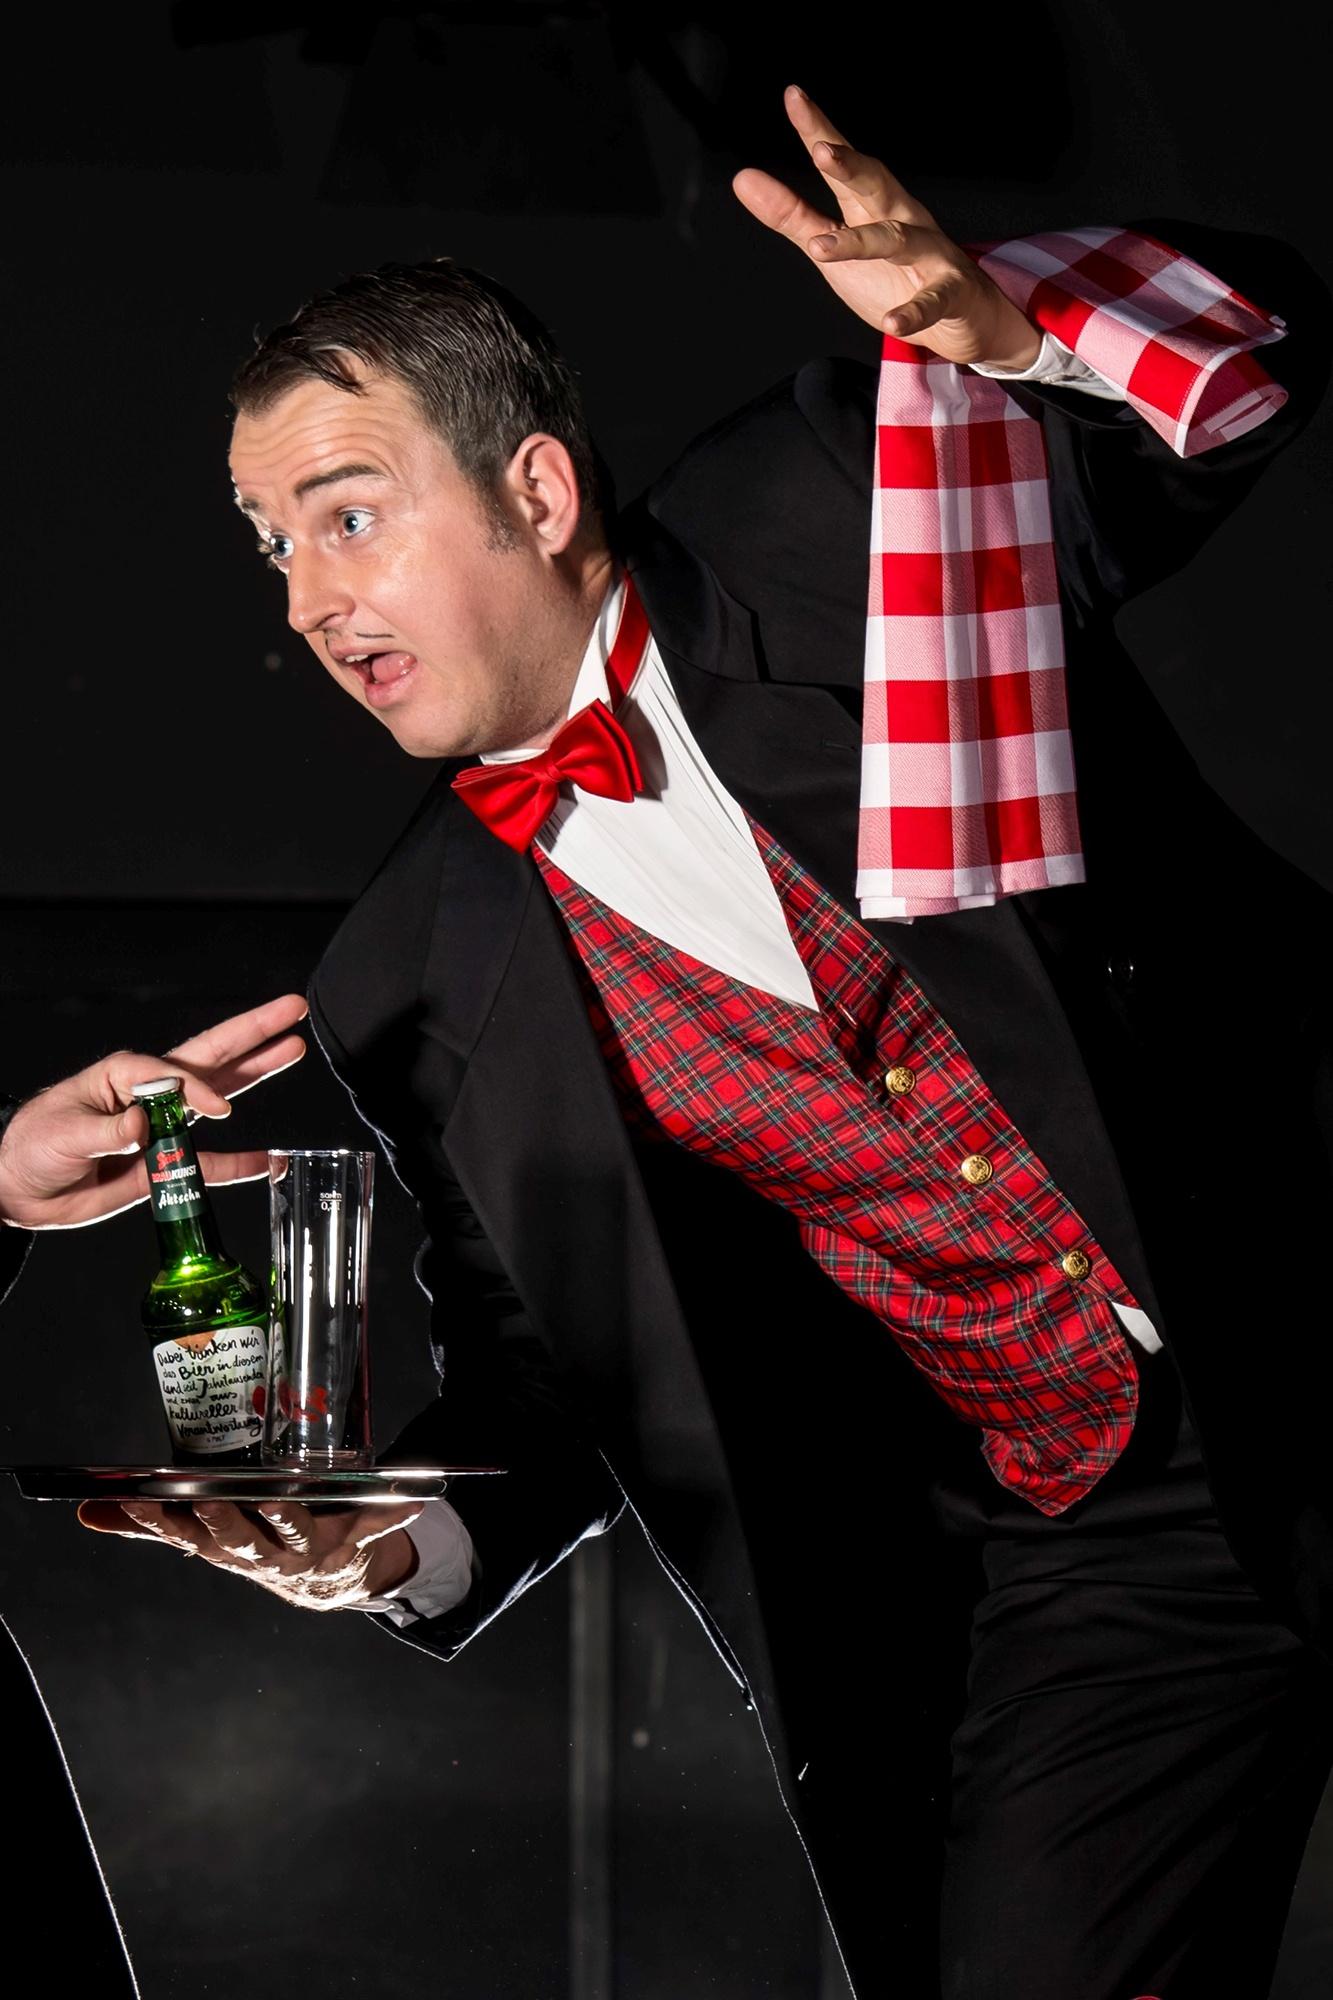 Comedy Kellner bzw. komisch lustige Kellner bei der Arbeit